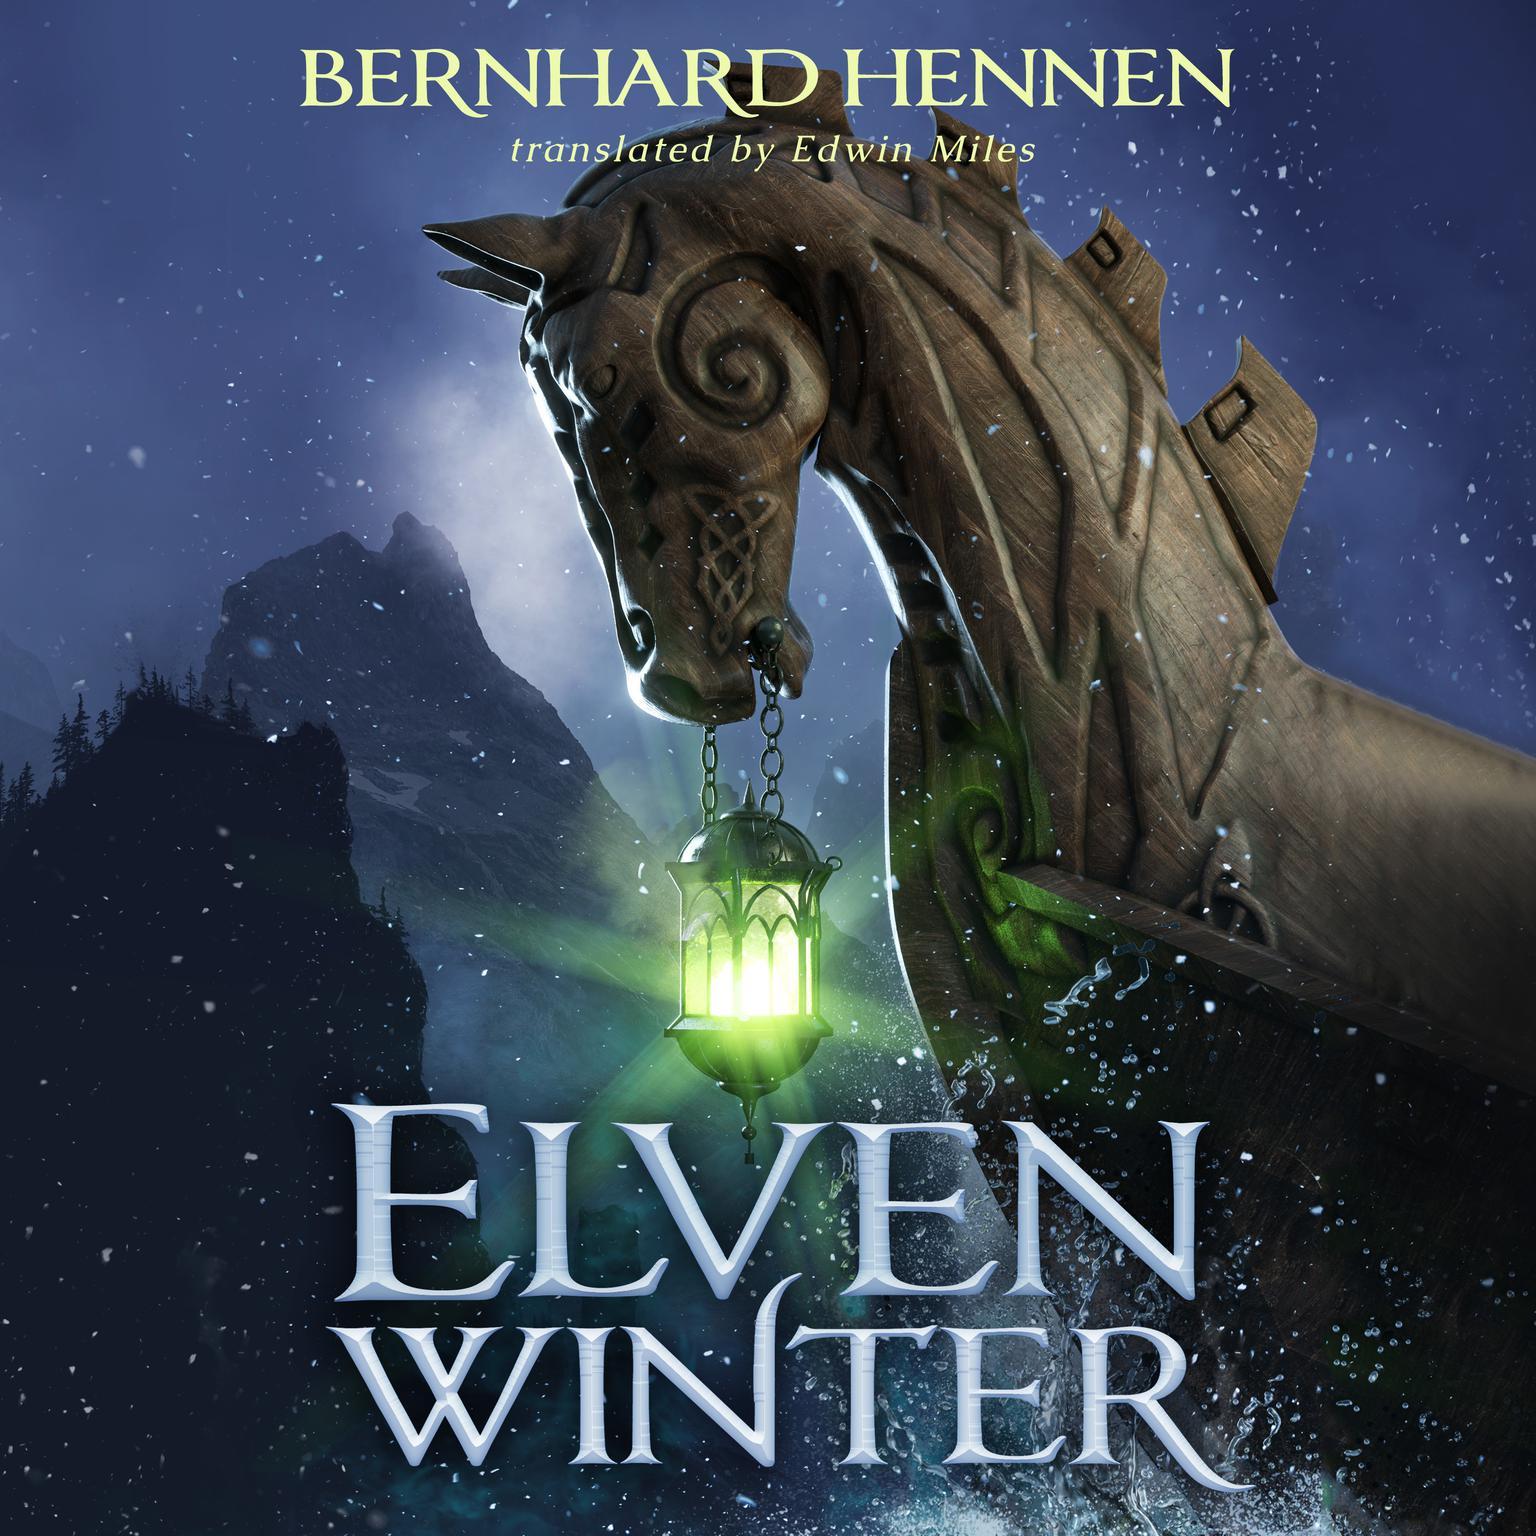 Elven Winter Audiobook, by Bernhard Hennen